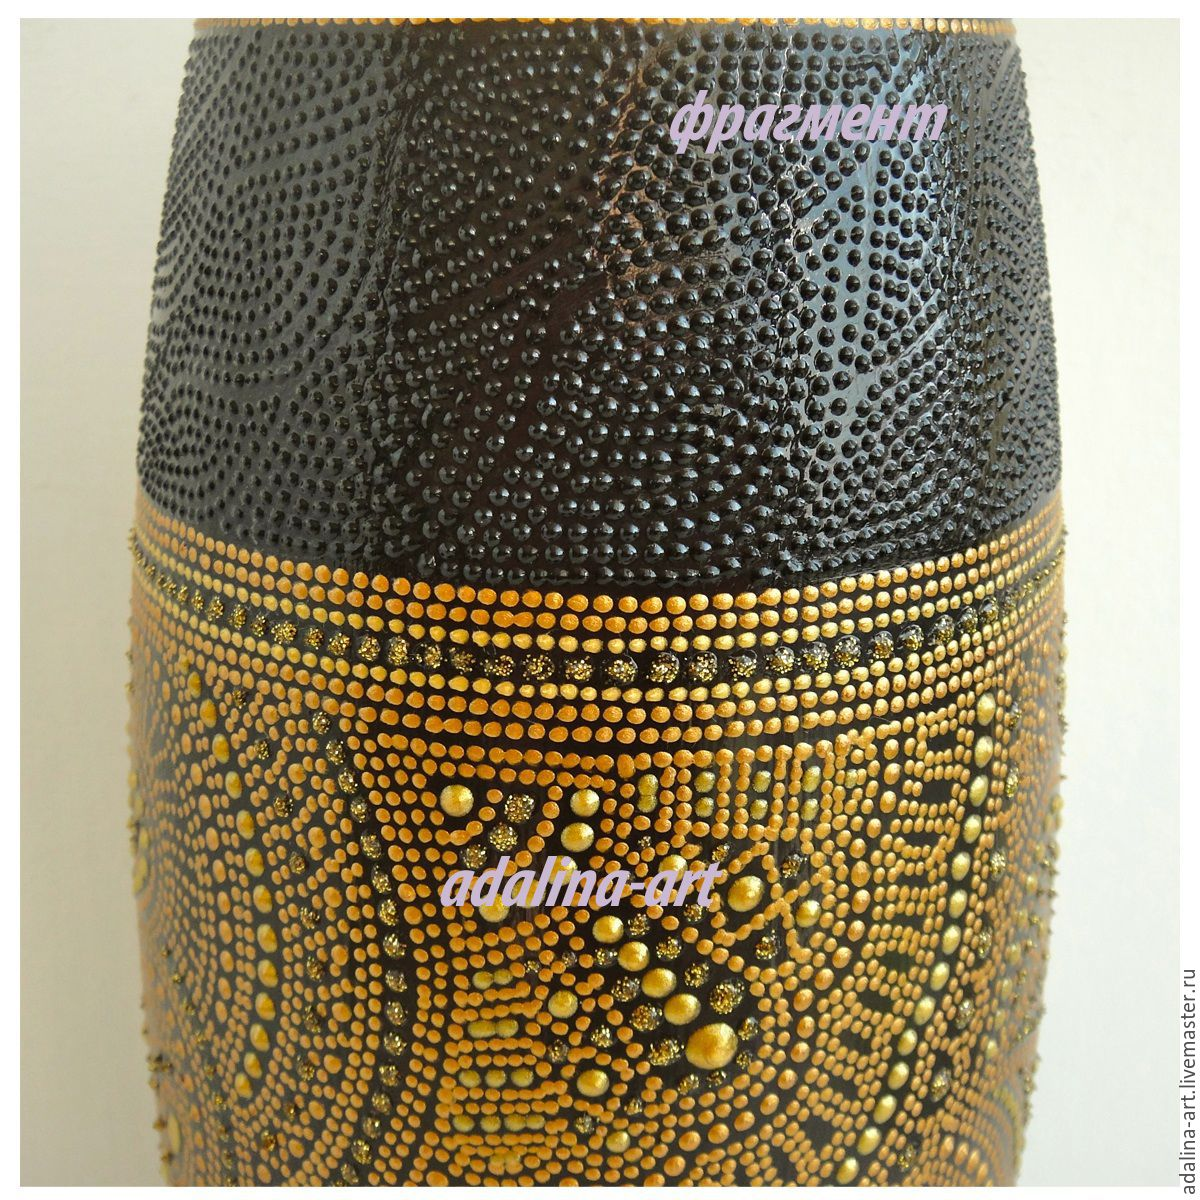 КАРАКУМЫ ваза Точечная роспись